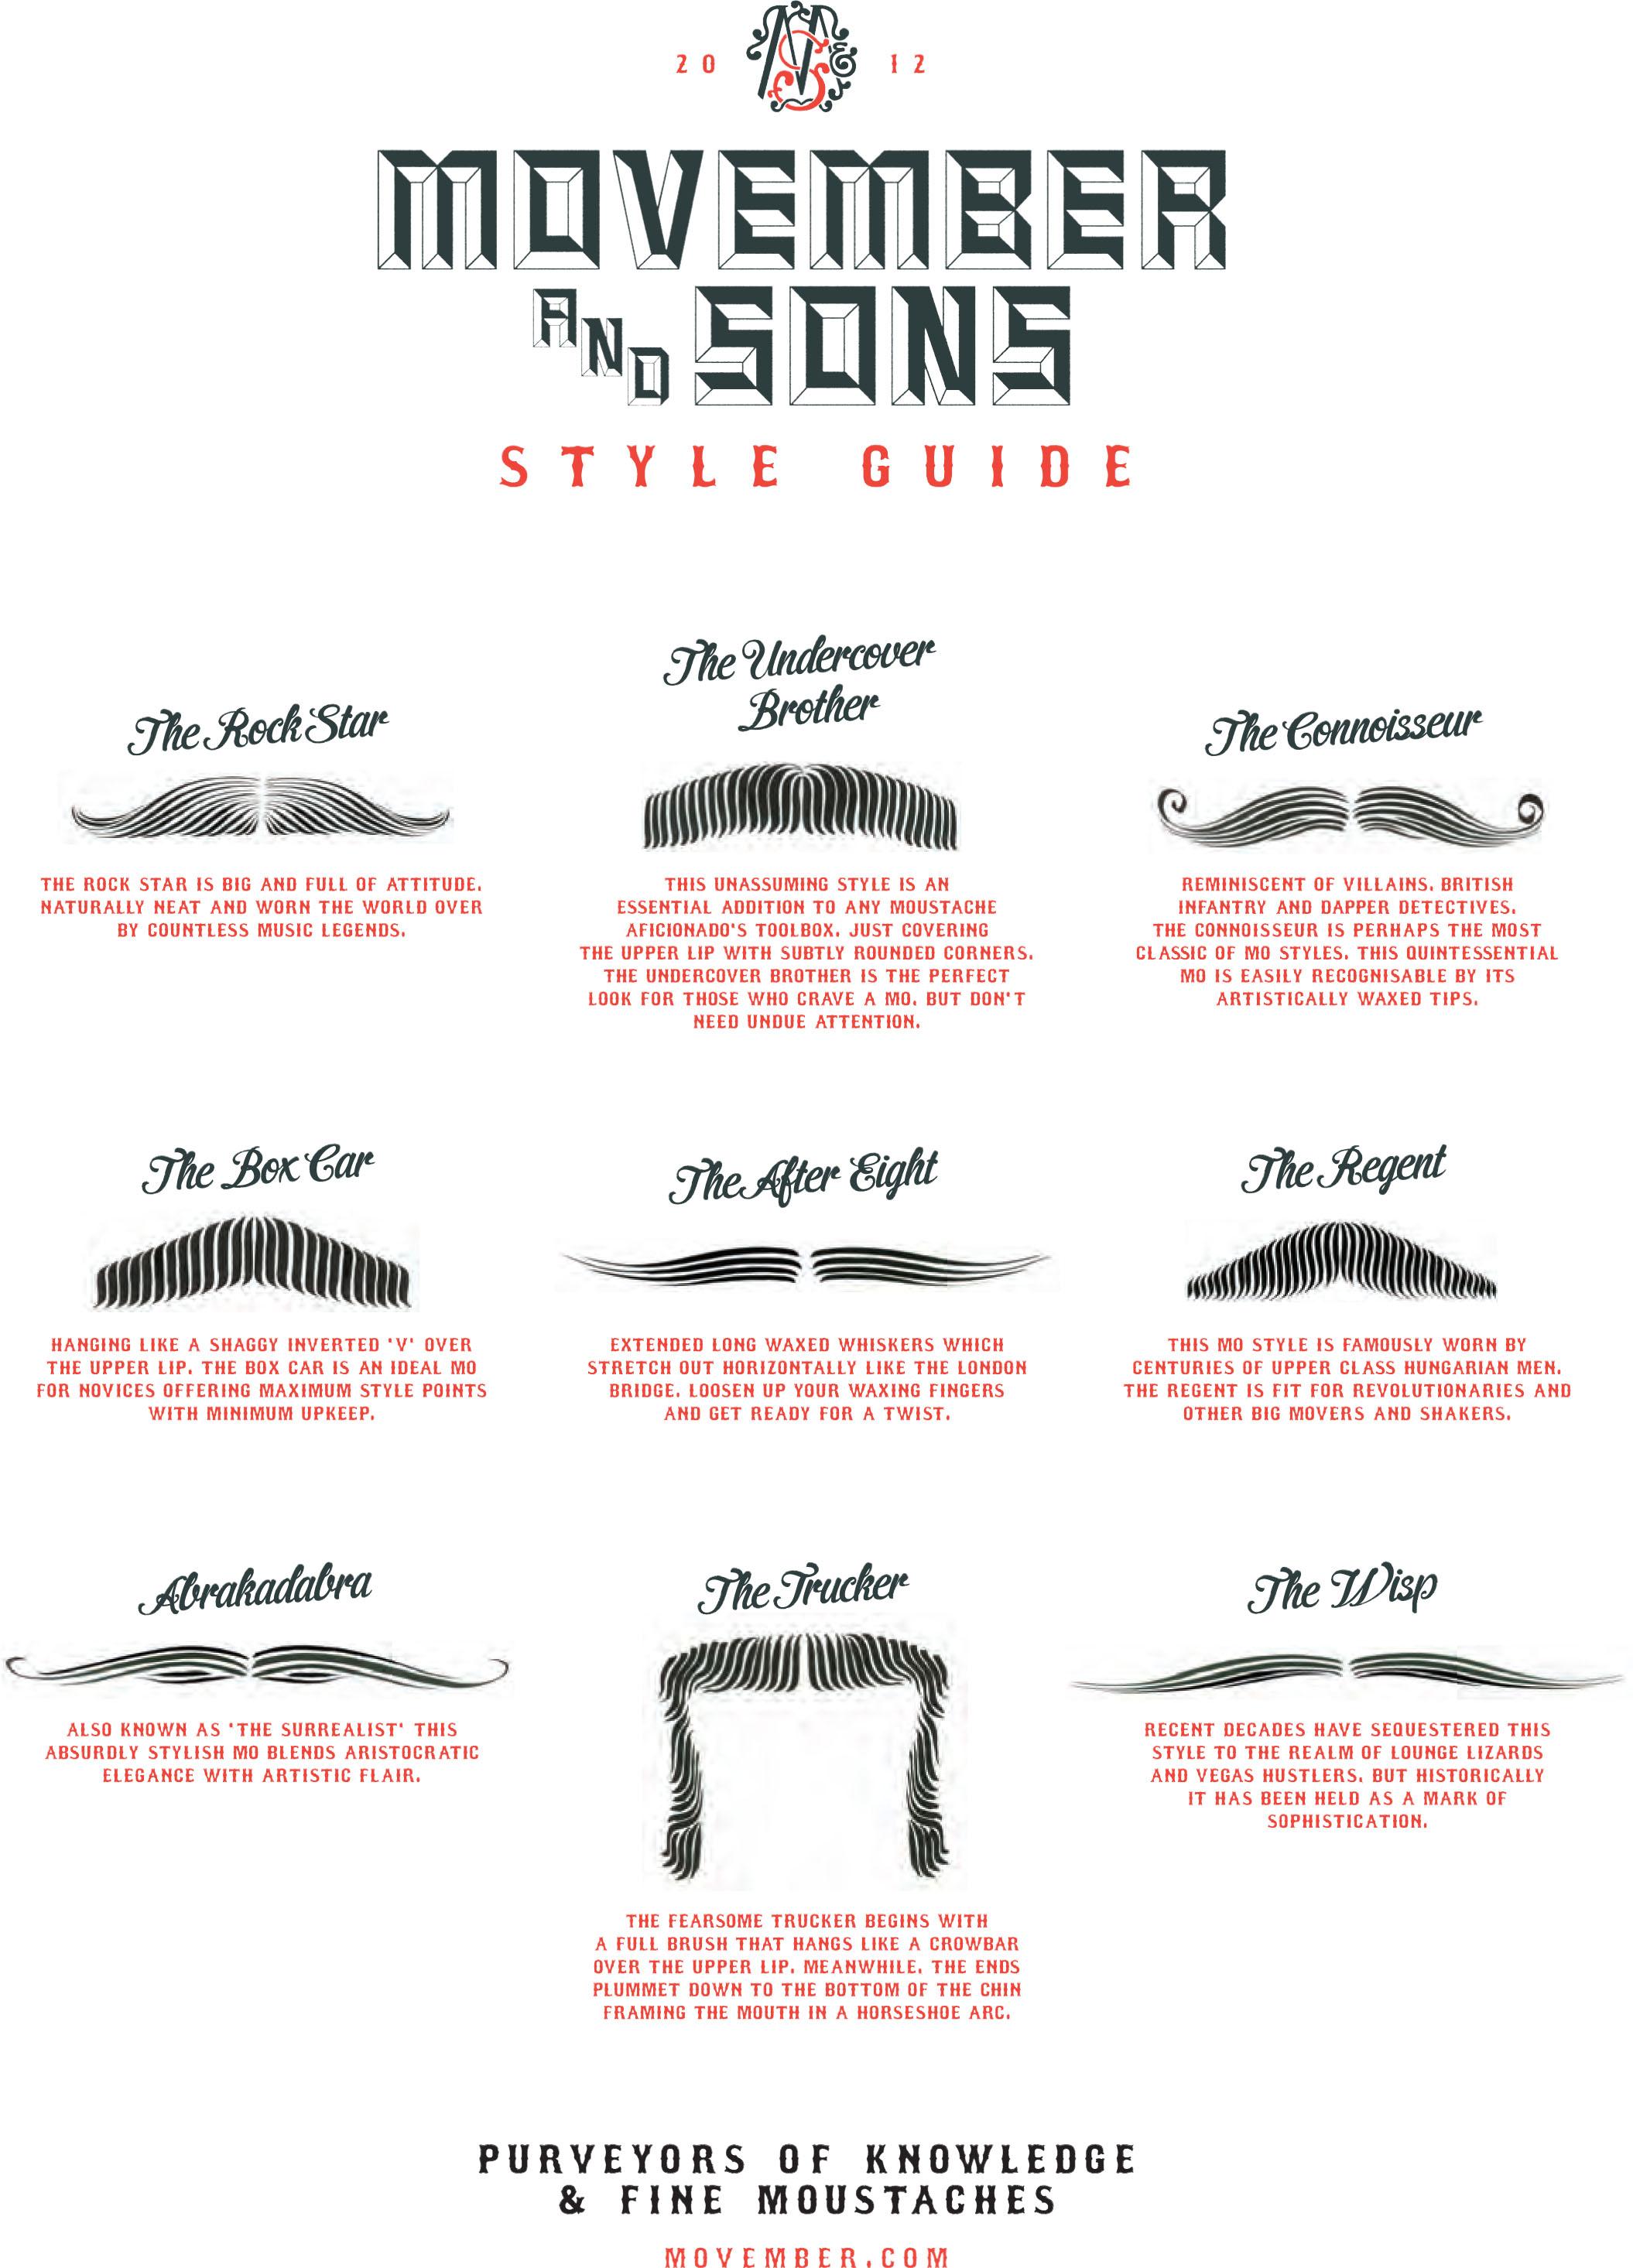 movember moustache style guide 2012. Black Bedroom Furniture Sets. Home Design Ideas